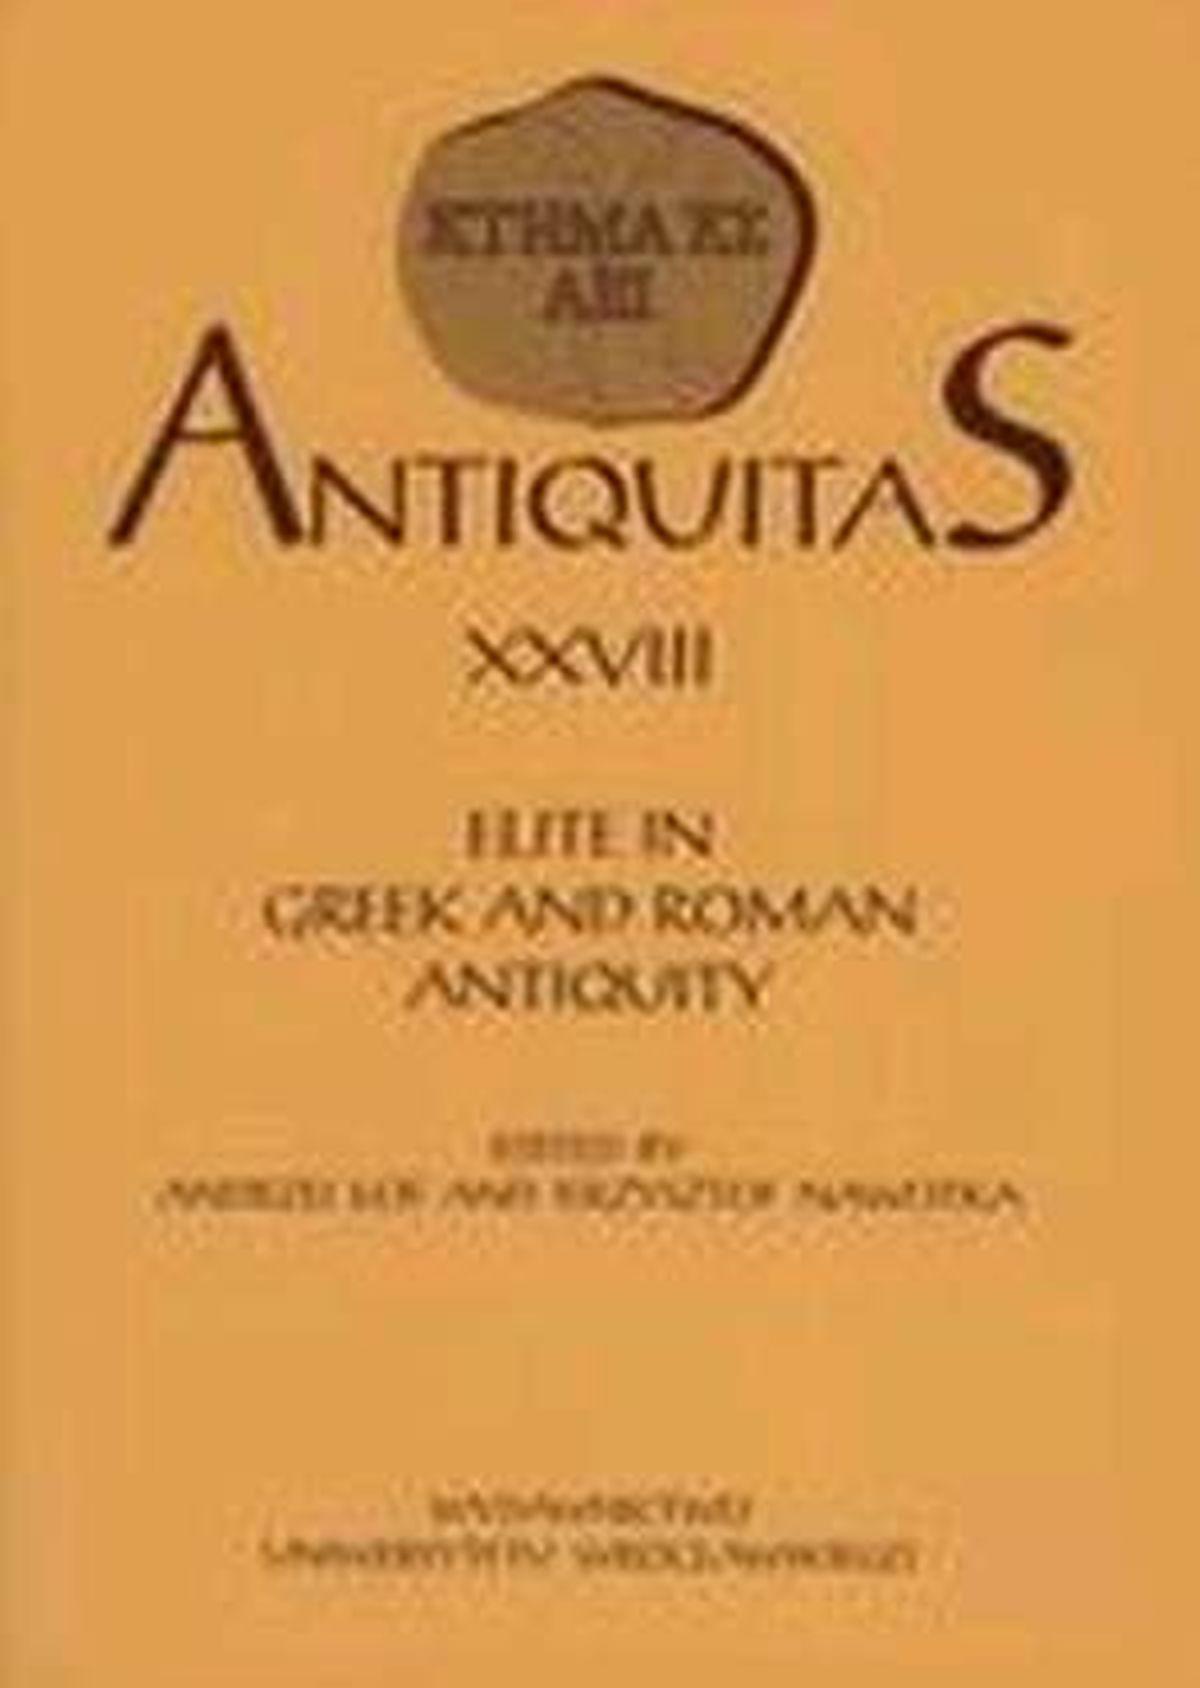 Antiquitas XXVIII